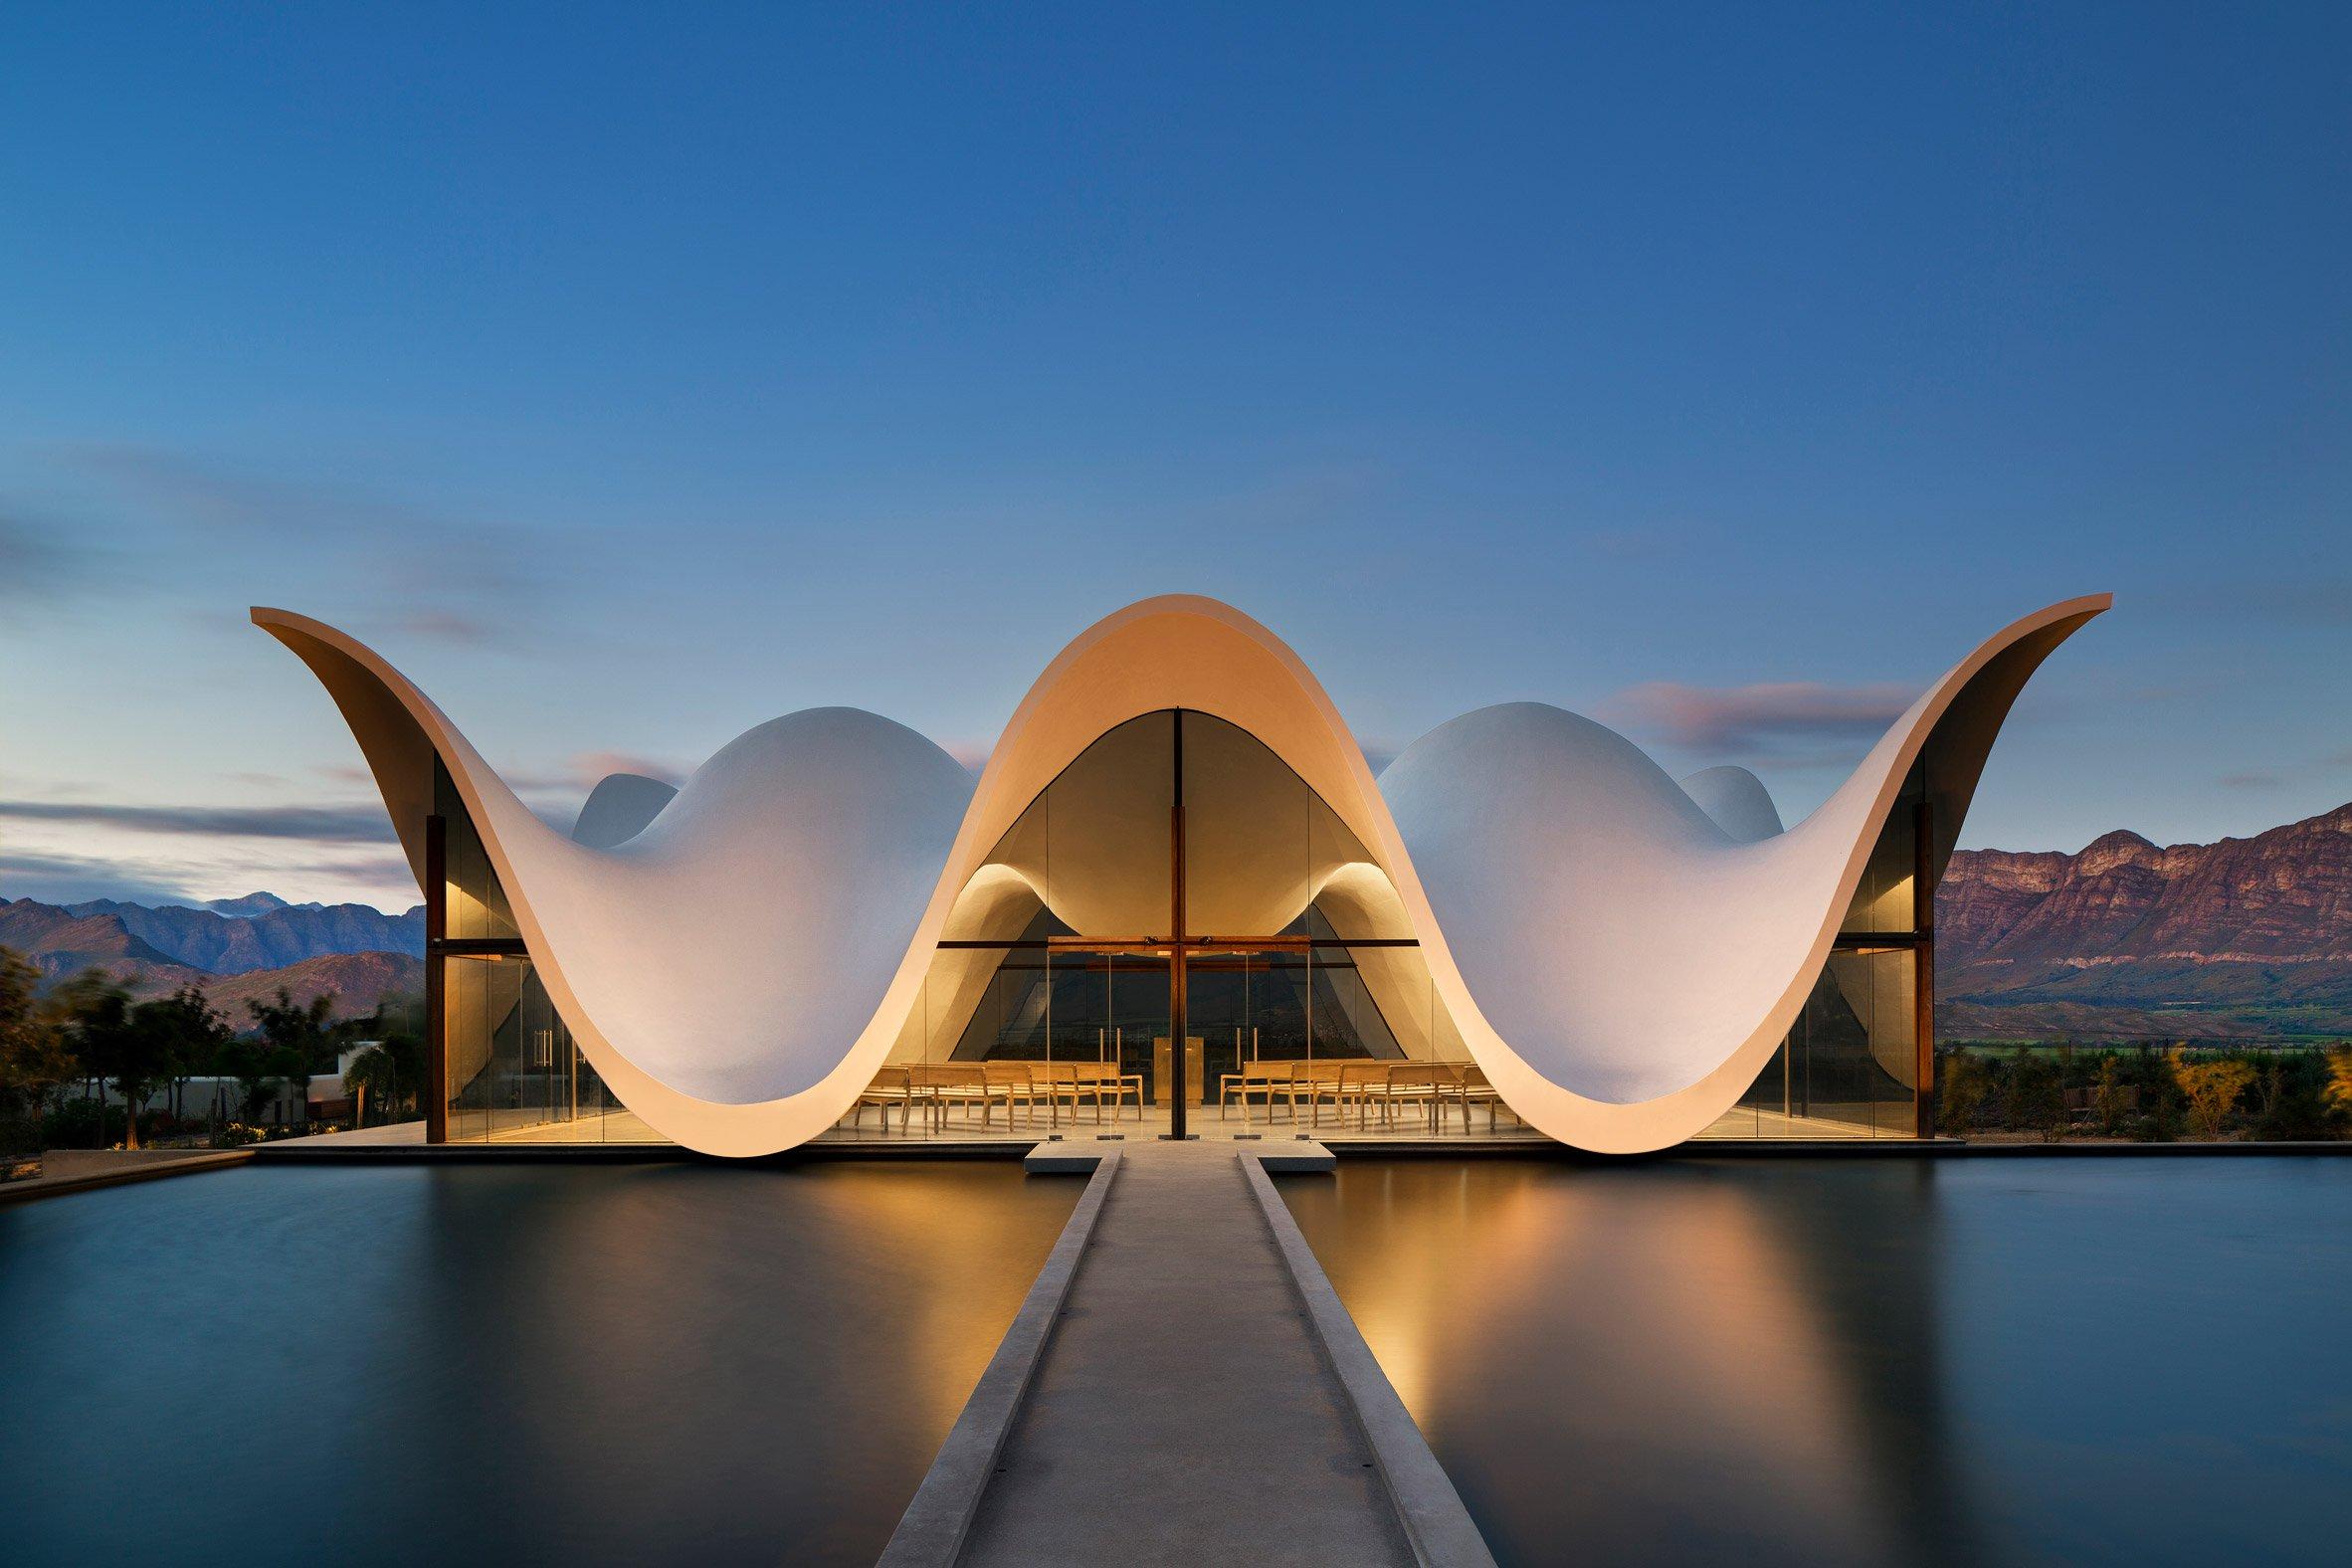 Bosjes Chapel, Ceres, Cape Town (South Africa), by Steyn Studio